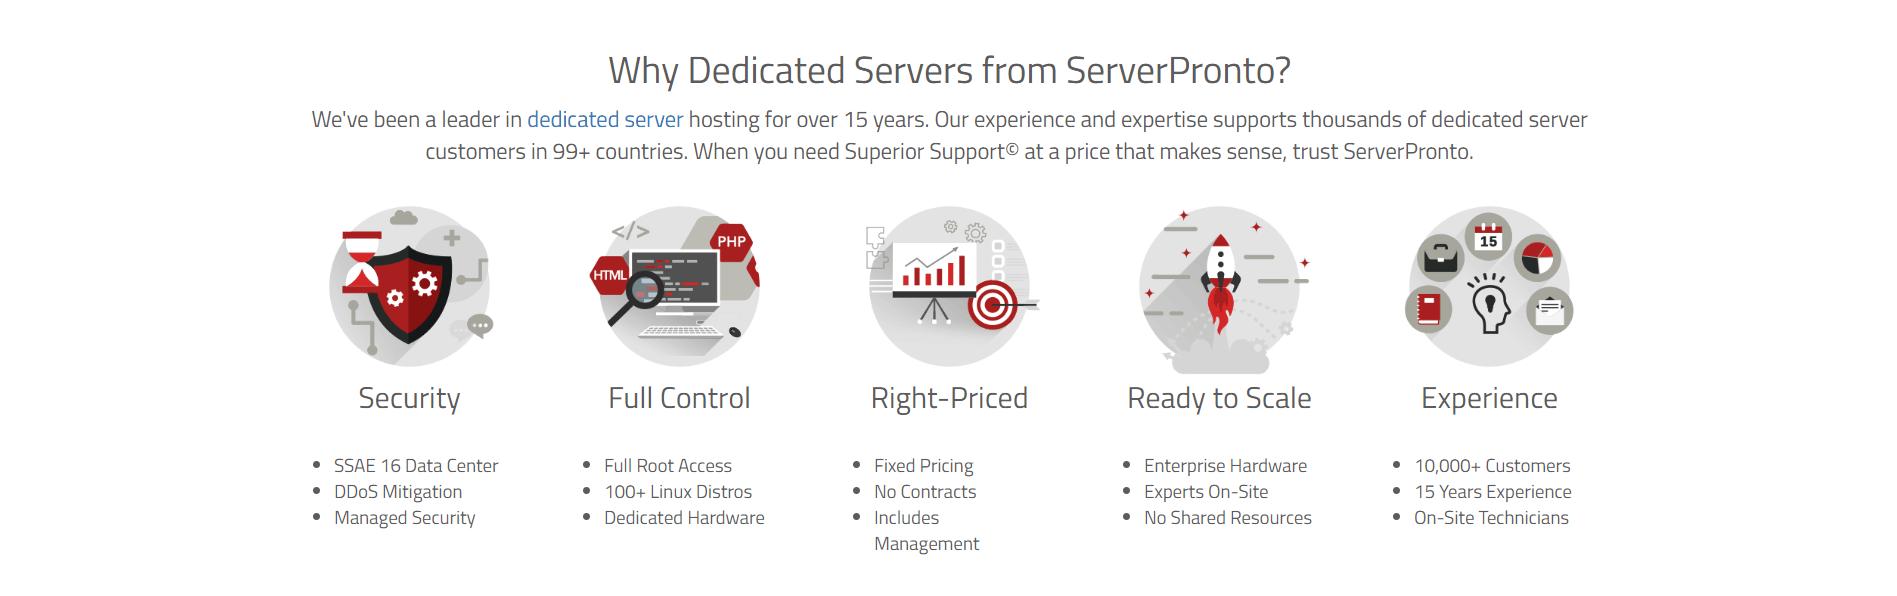 serverpronto-features